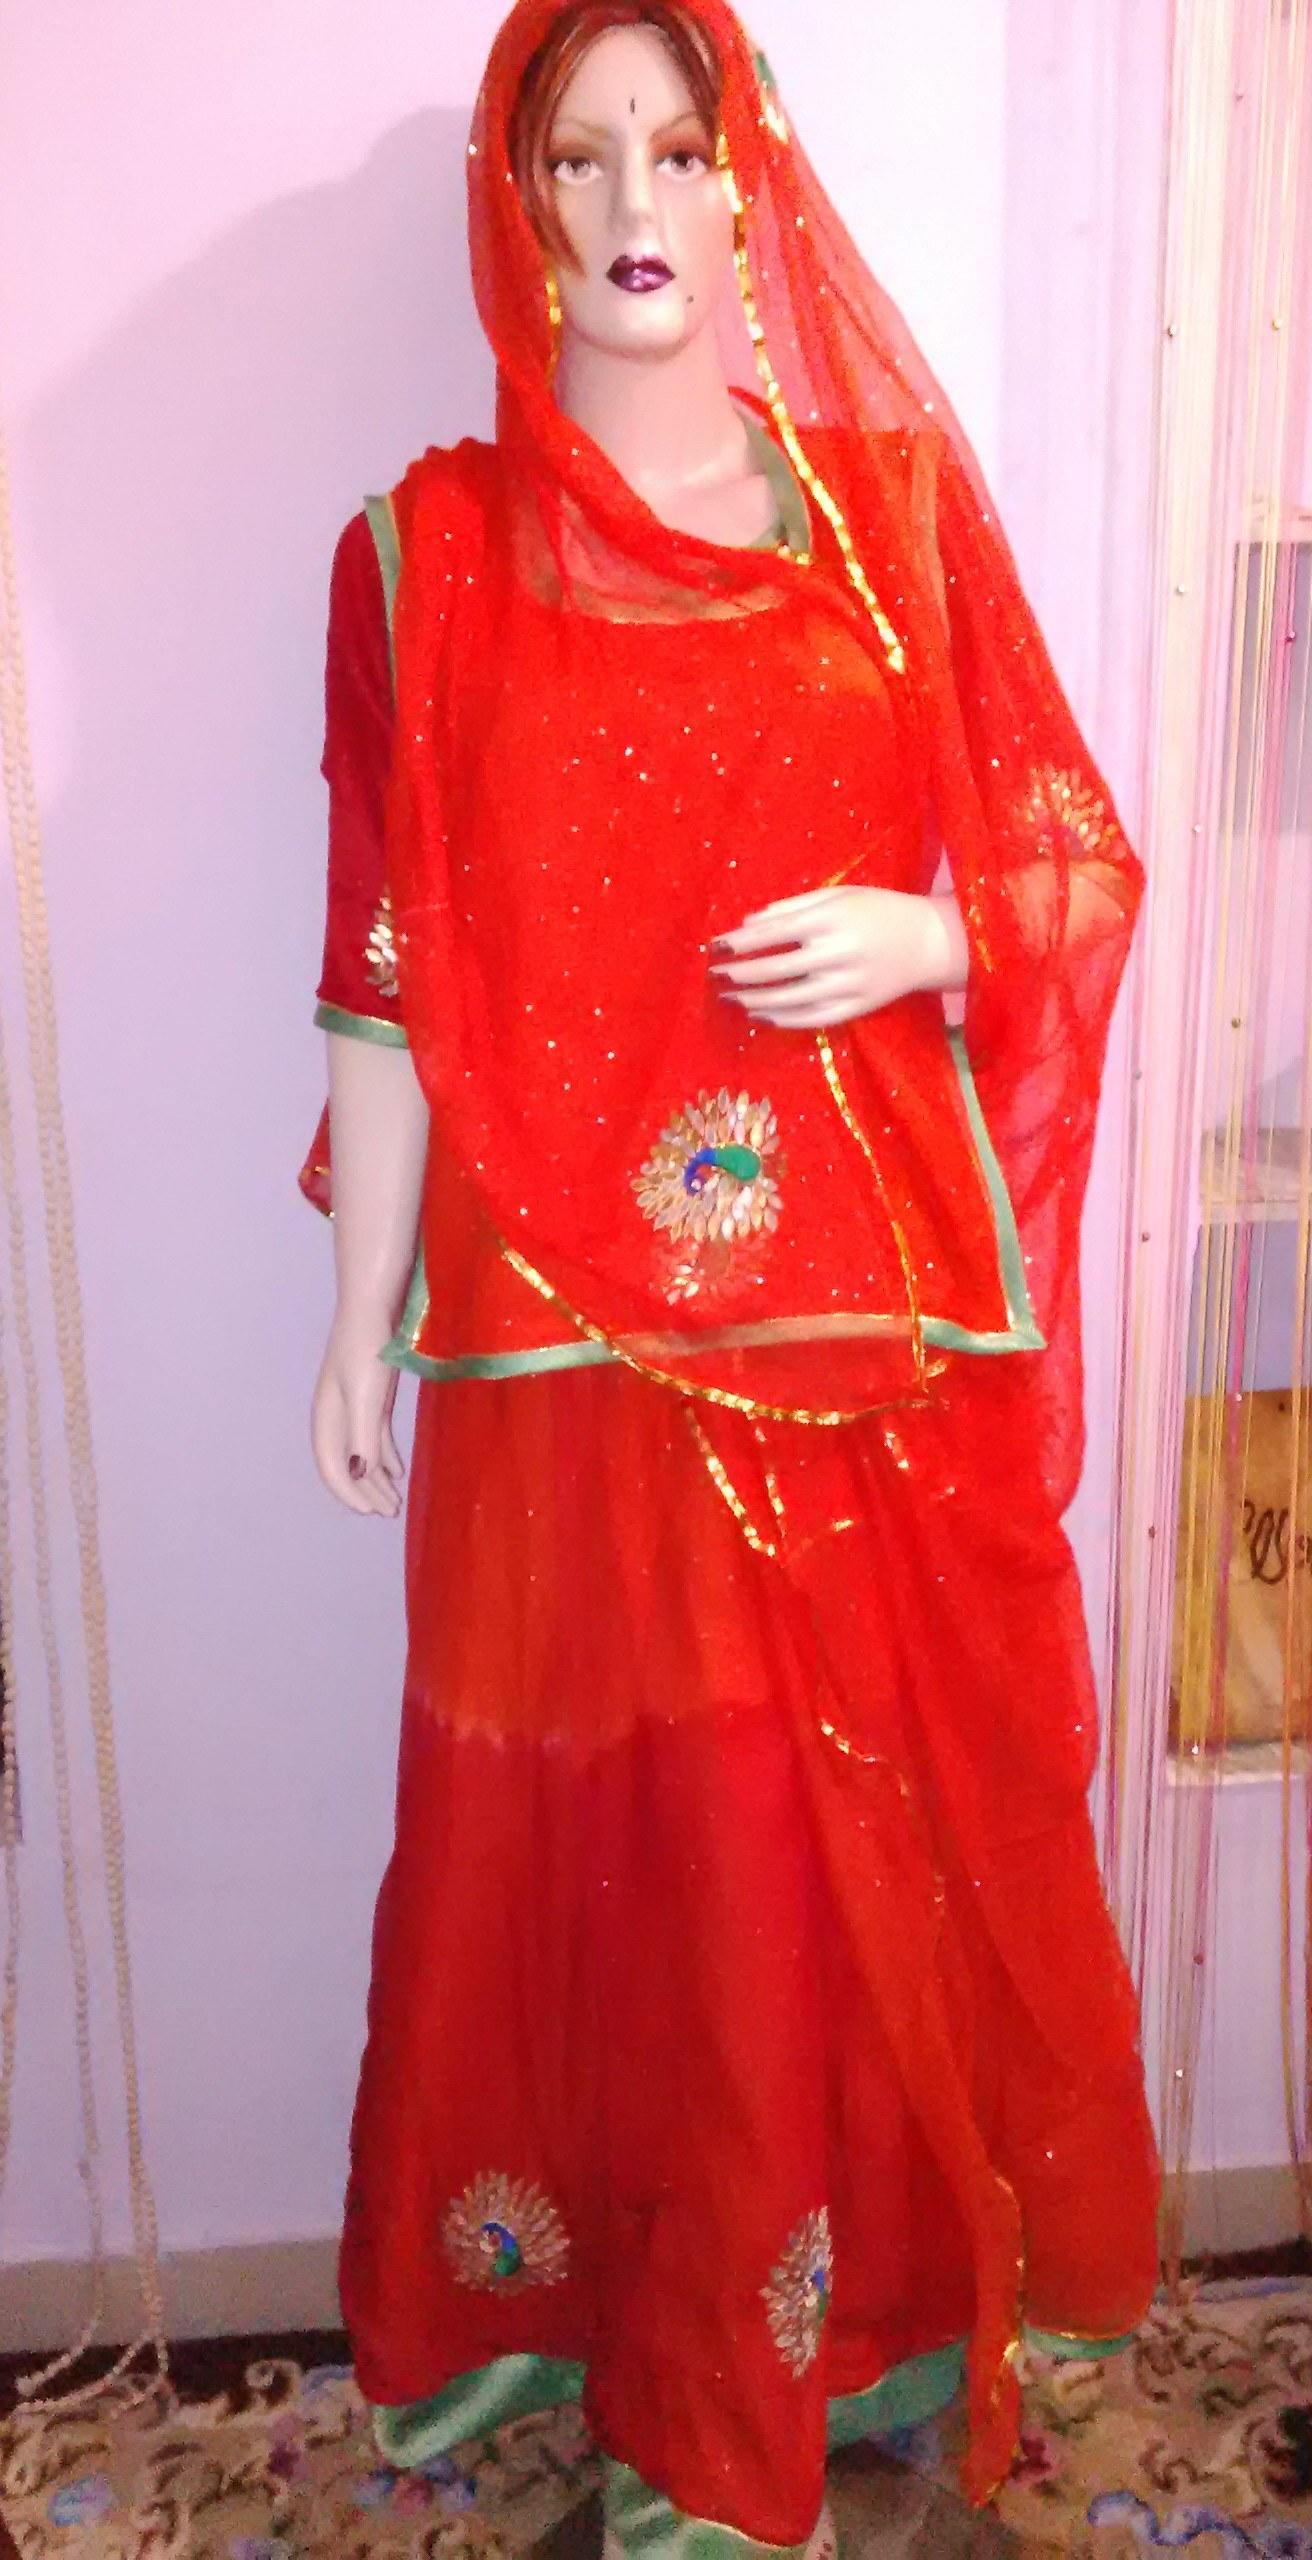 Designer Rajputi Poshak Available At Craftsvilla For Rs 6000